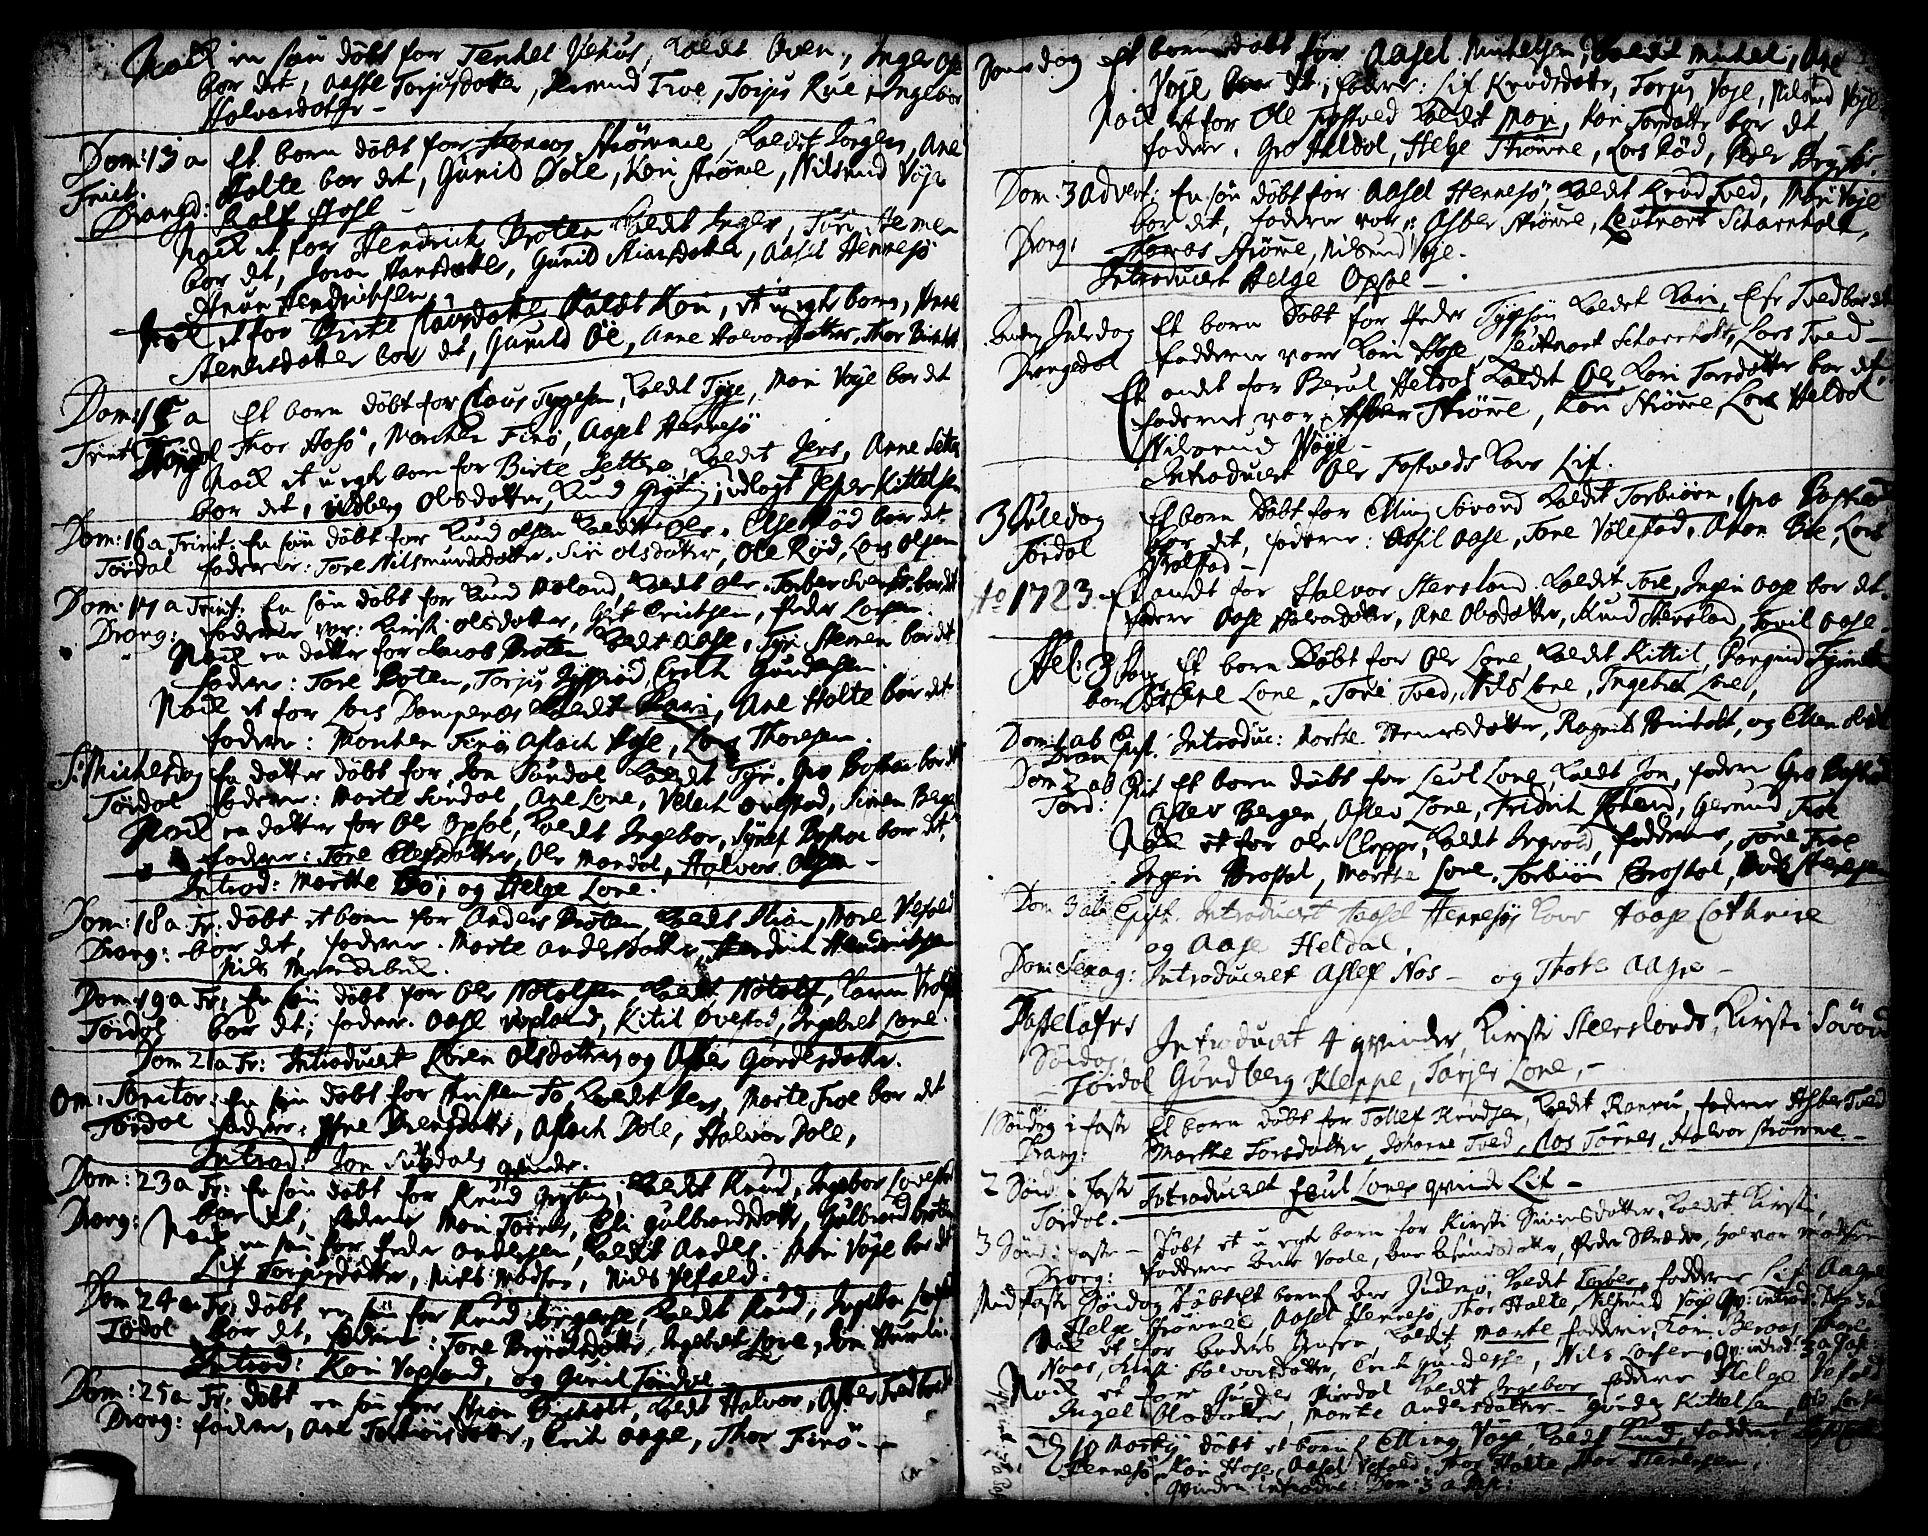 SAKO, Drangedal kirkebøker, F/Fa/L0001: Ministerialbok nr. 1, 1697-1767, s. 44